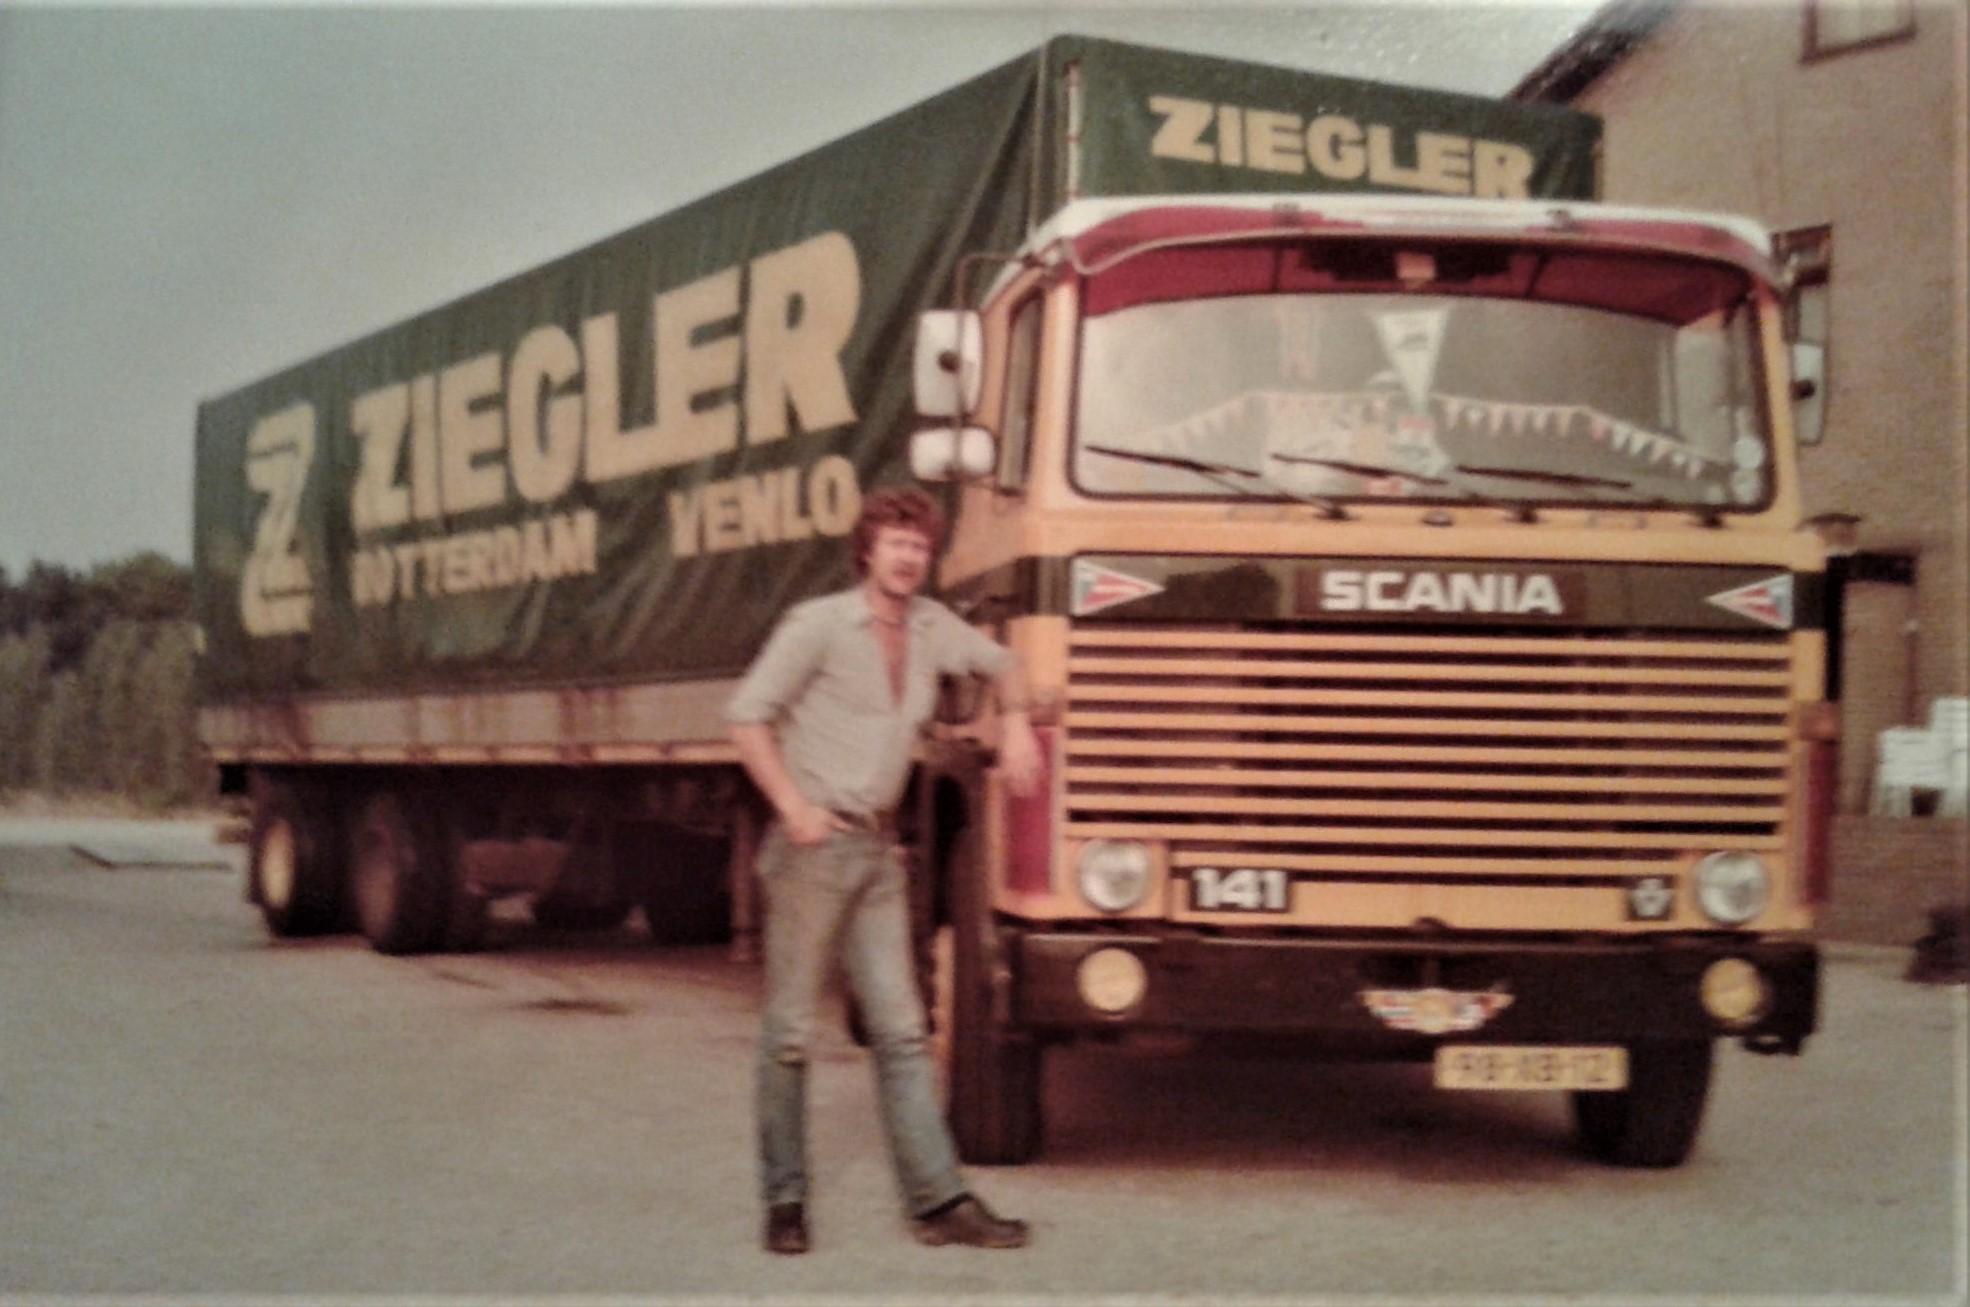 Het-Schwanenhaus-Dirk--archief-A-Lex-Groenewoud--2